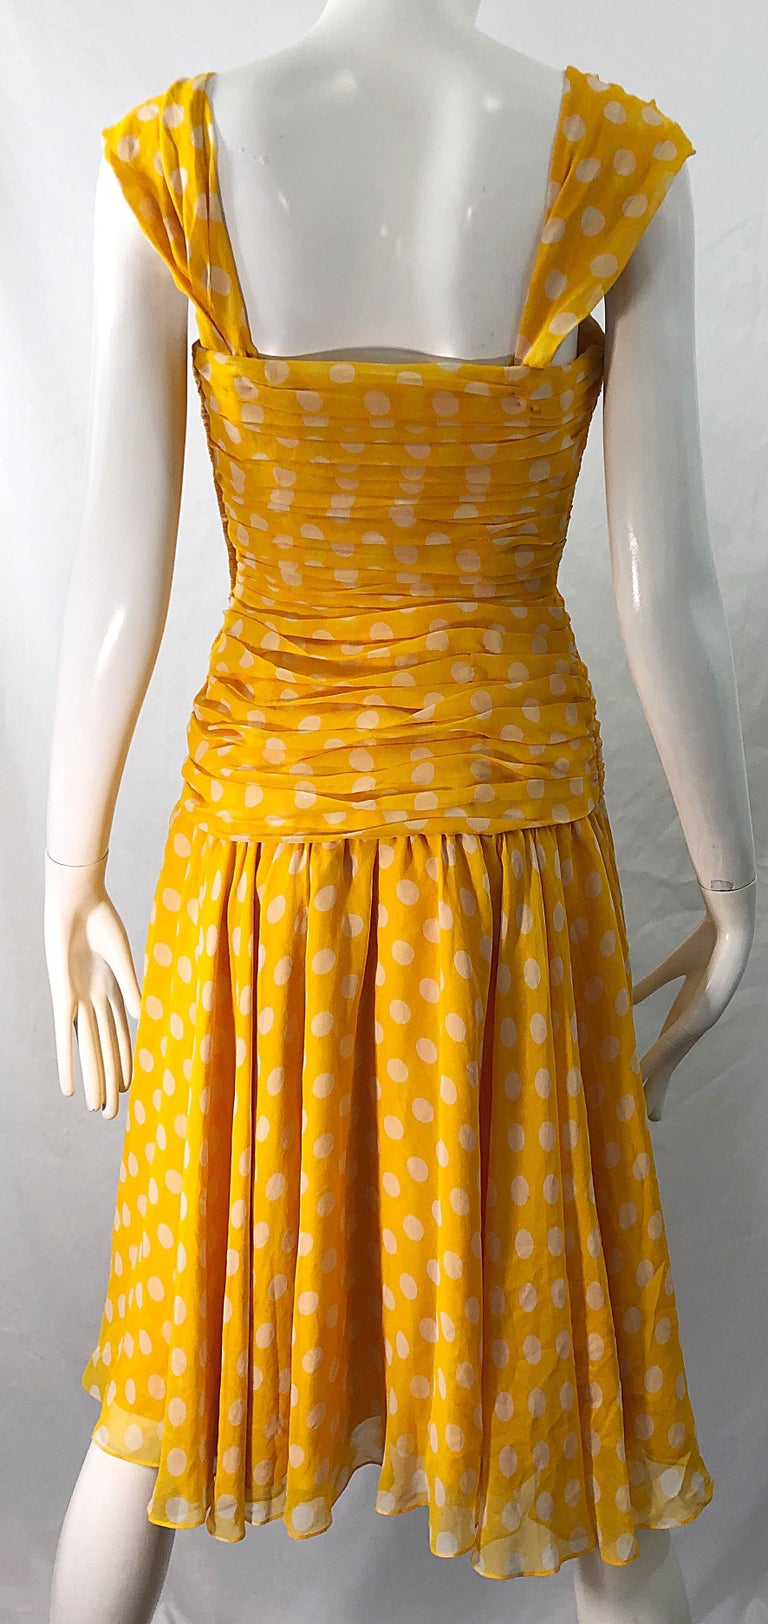 Adele Simpson 1980s Size 4 Yellow White Silk Chiffon Polka Dot Vintage 80s Dress For Sale 3